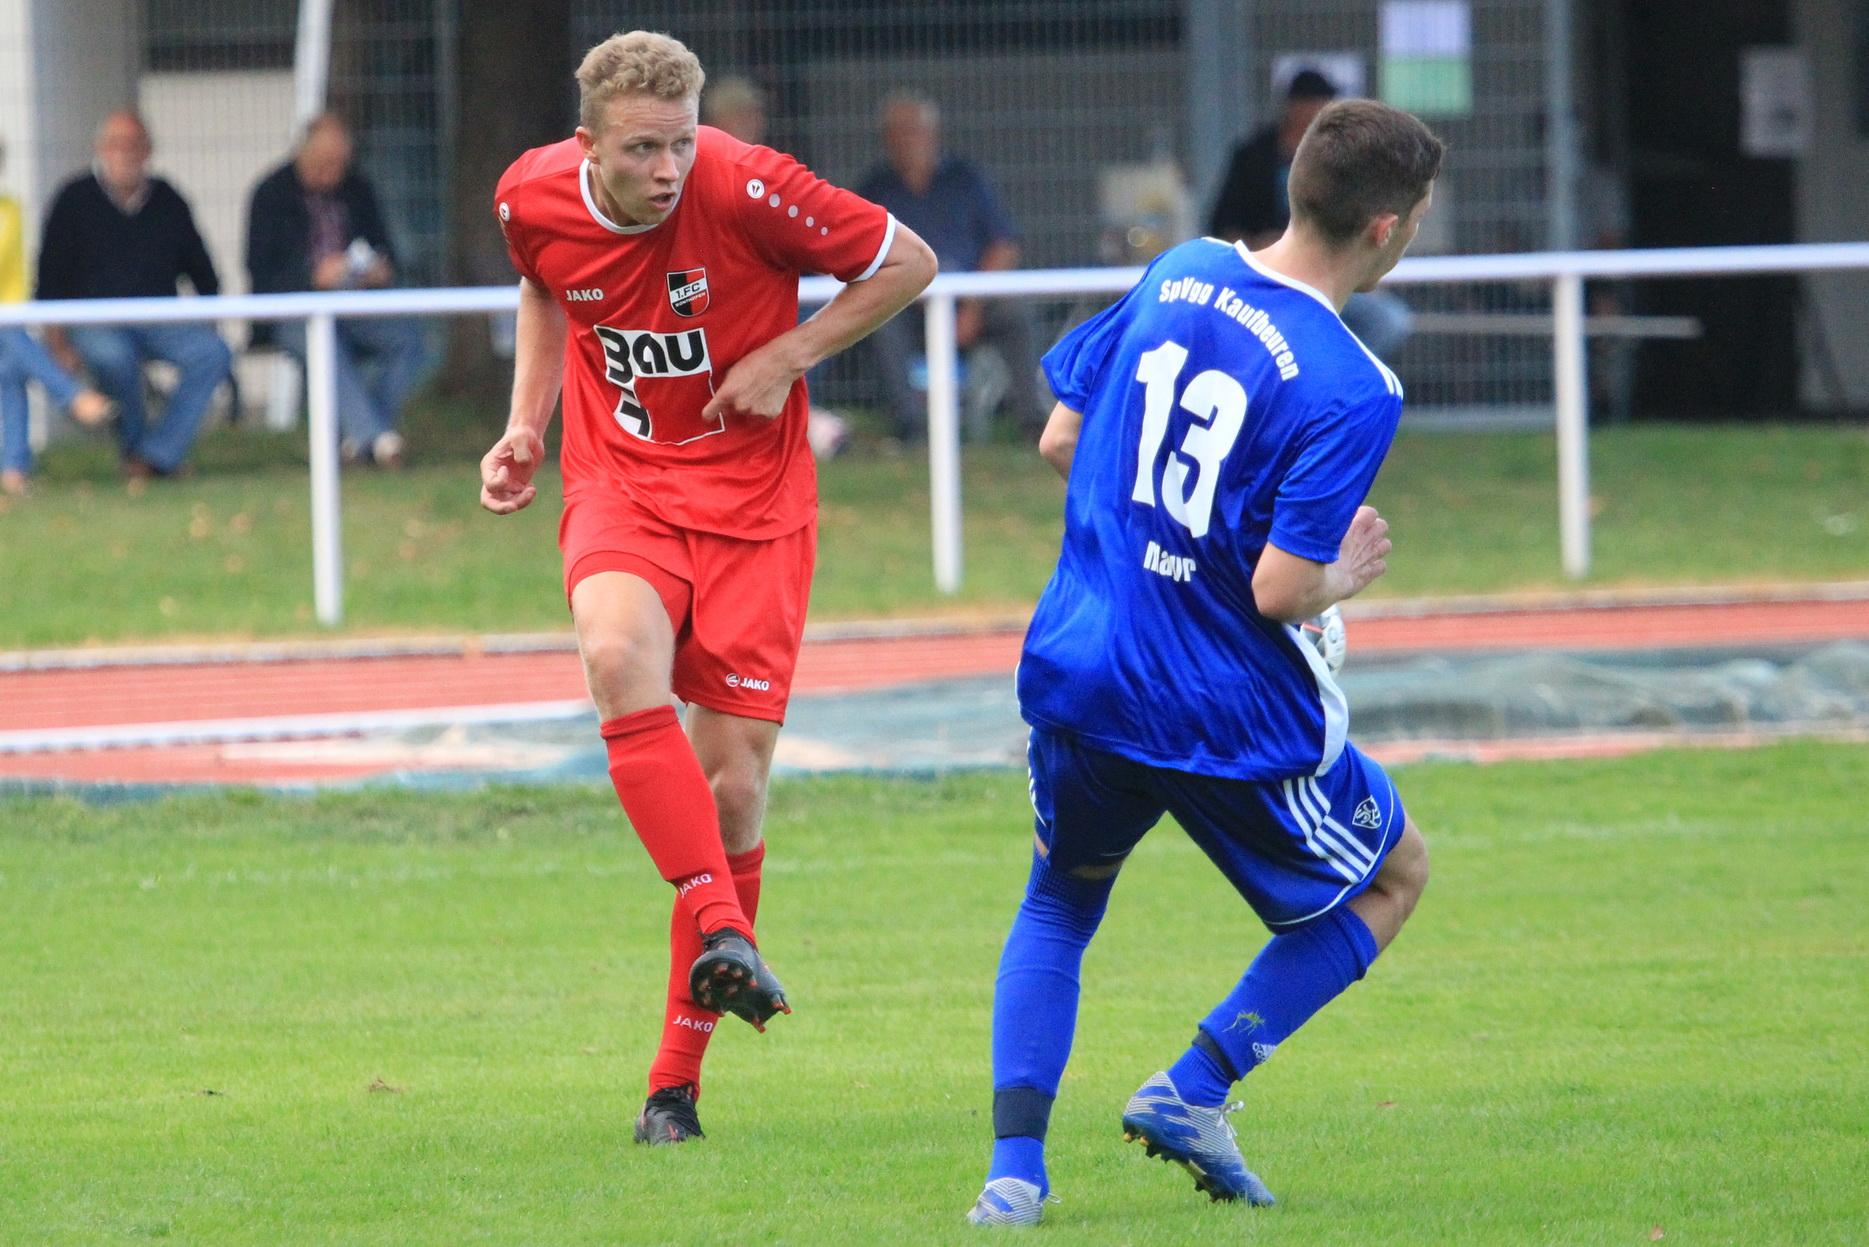 FC Gundelfingen – 1.FC Sonthofen (Samstag) TSV Kottern II – 1.FC Sonthofen II (Sonntag)